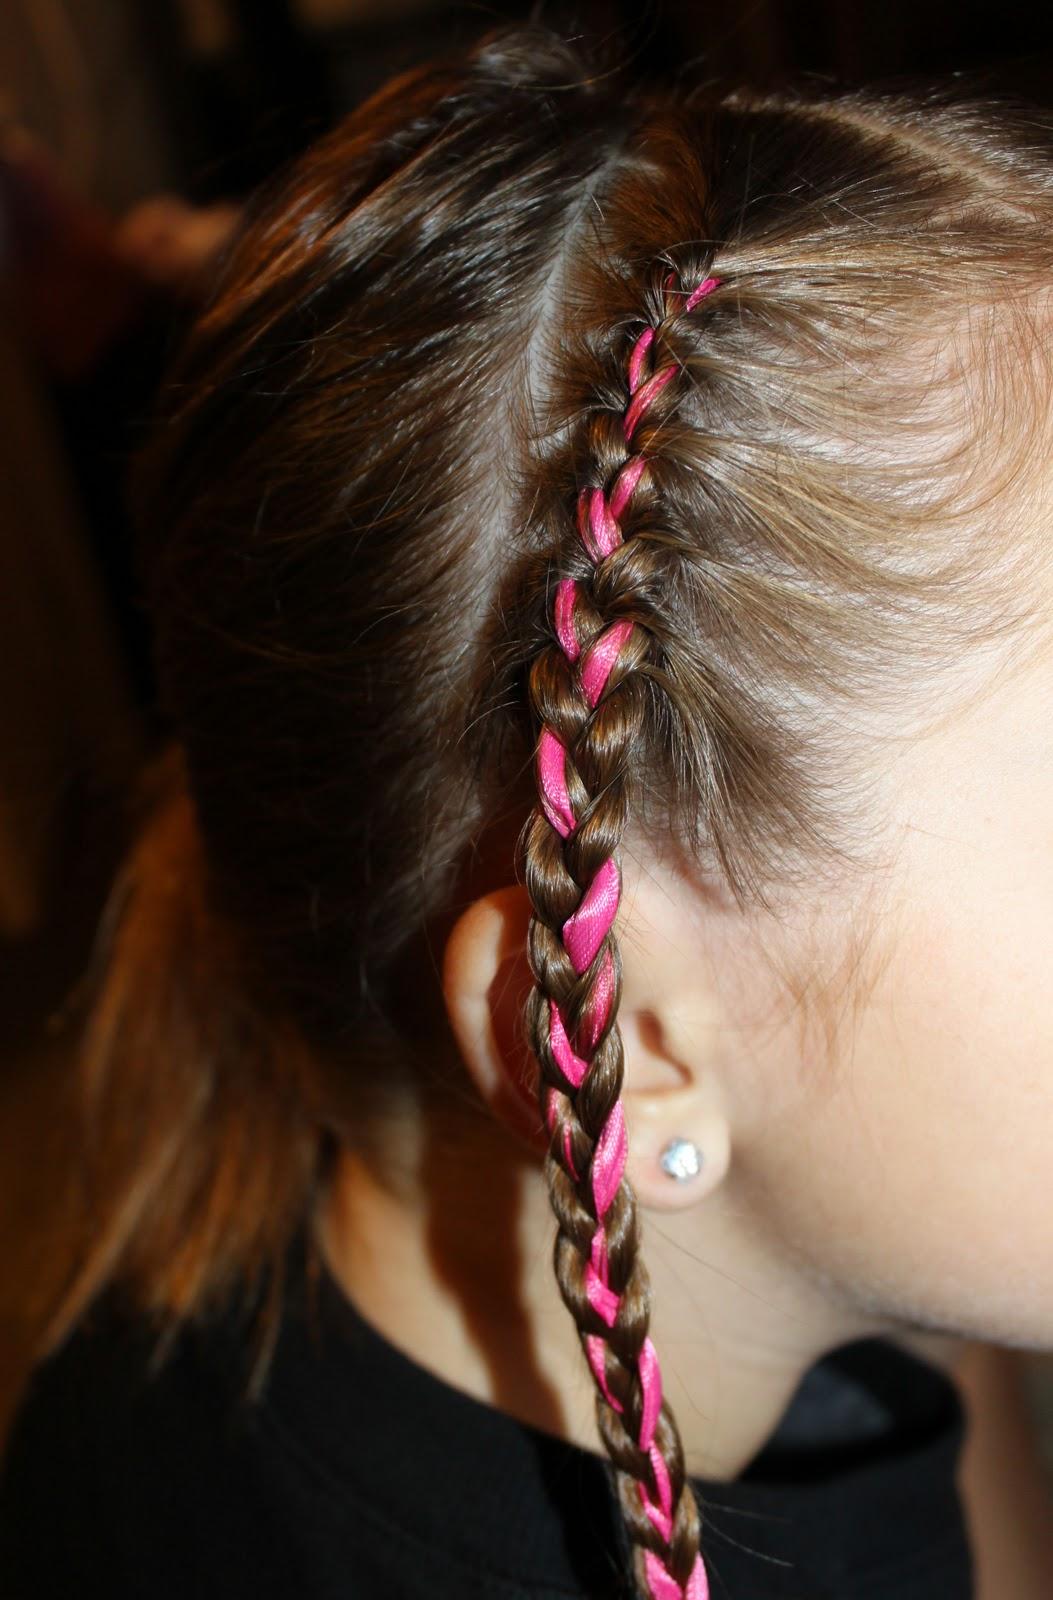 Outstanding Hairstyles For Girls The Wright Hair Ribbon Braids Headband Short Hairstyles For Black Women Fulllsitofus